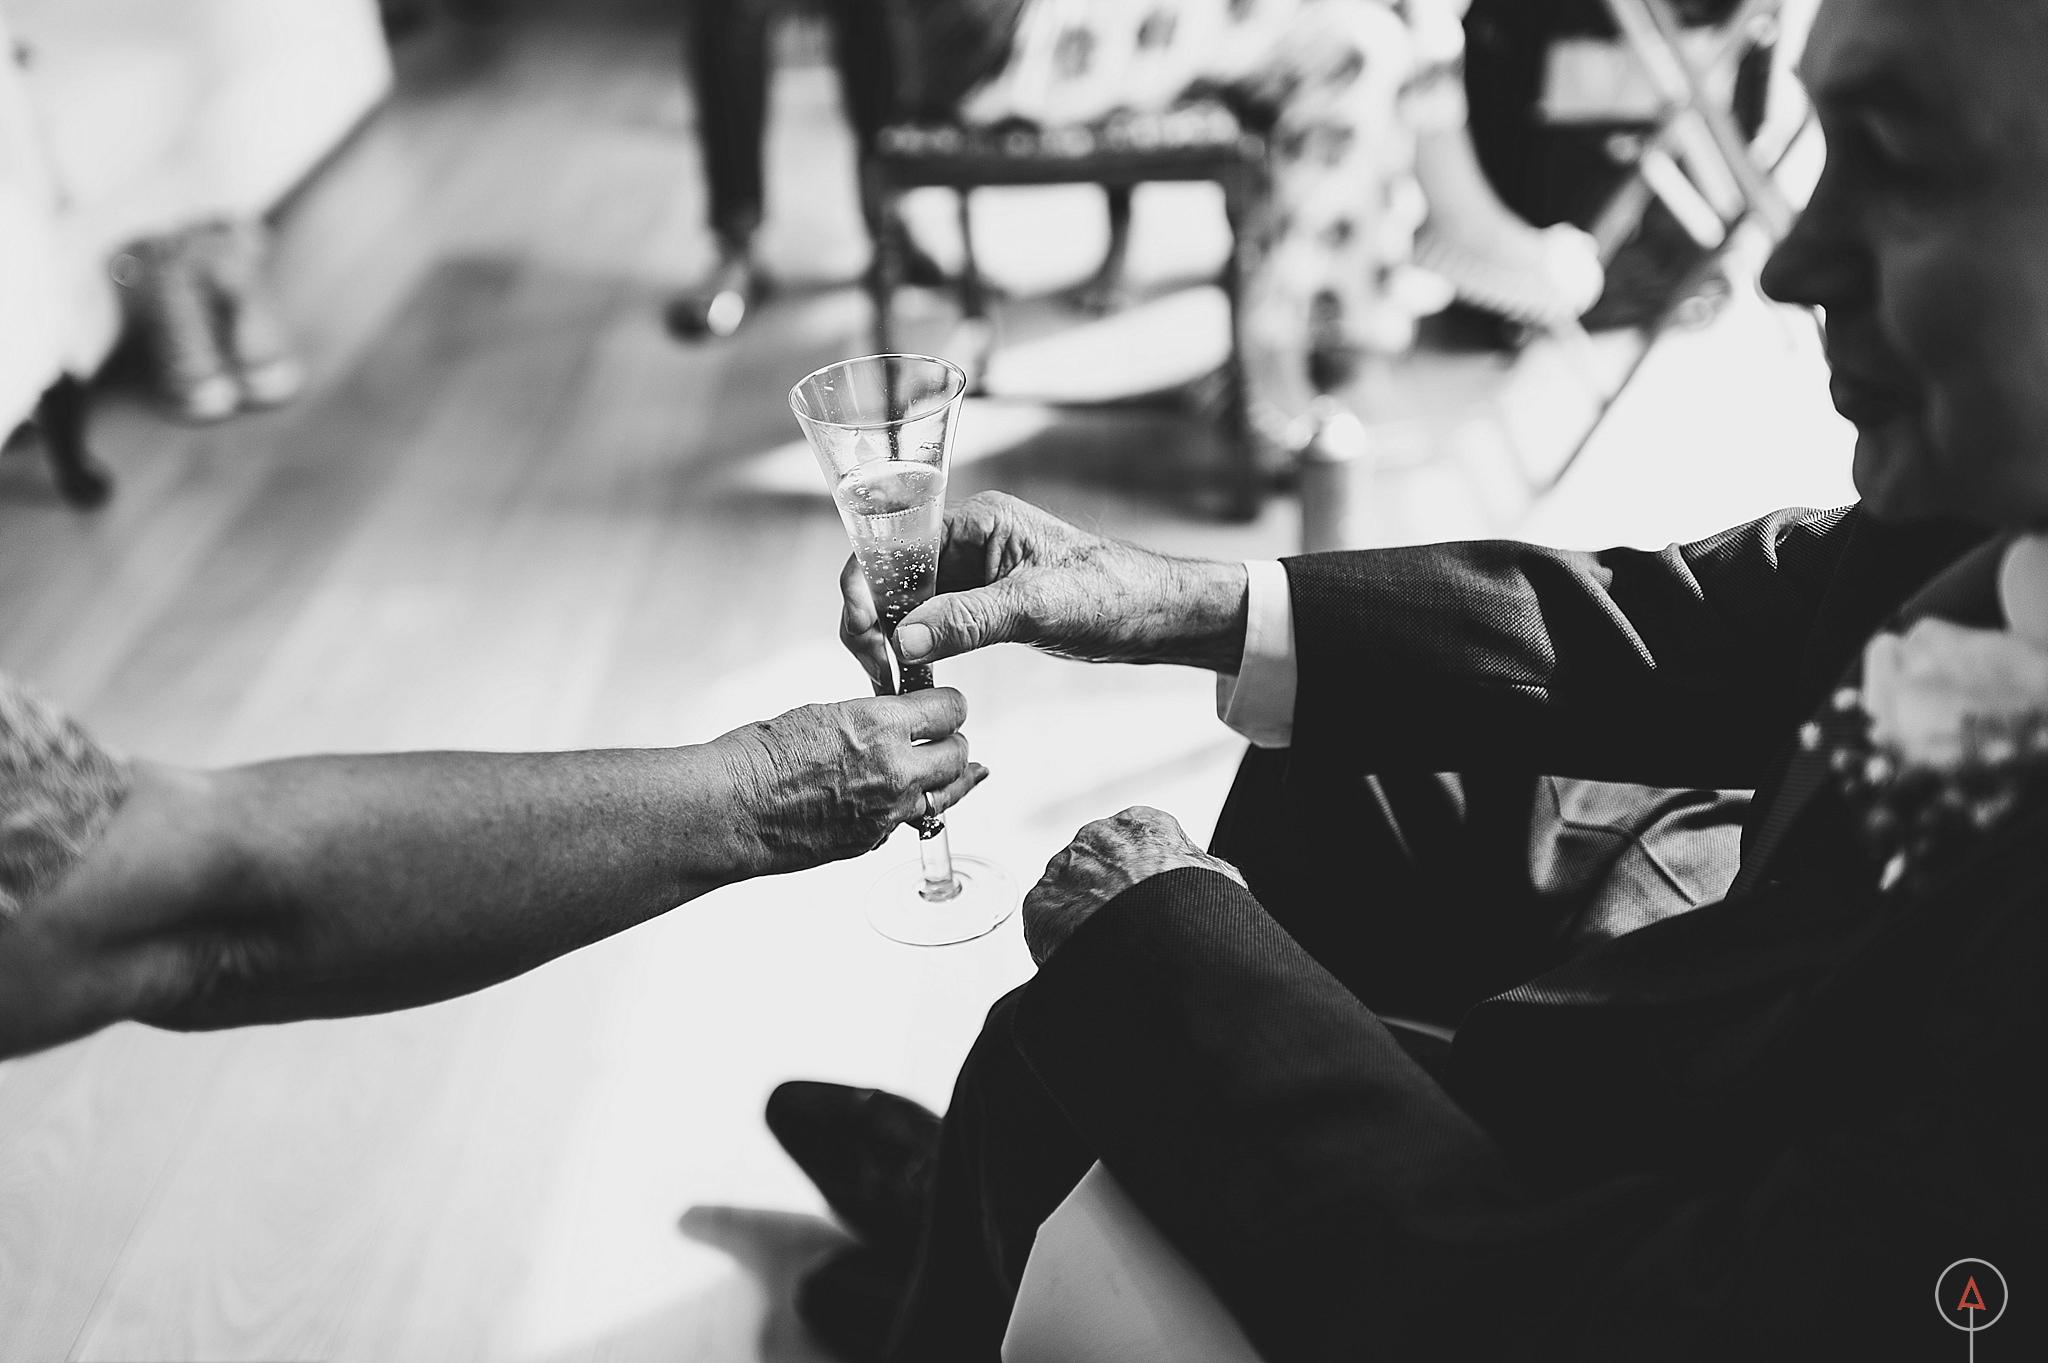 cardiff-wedding-photographer-aga-tomaszek_0342